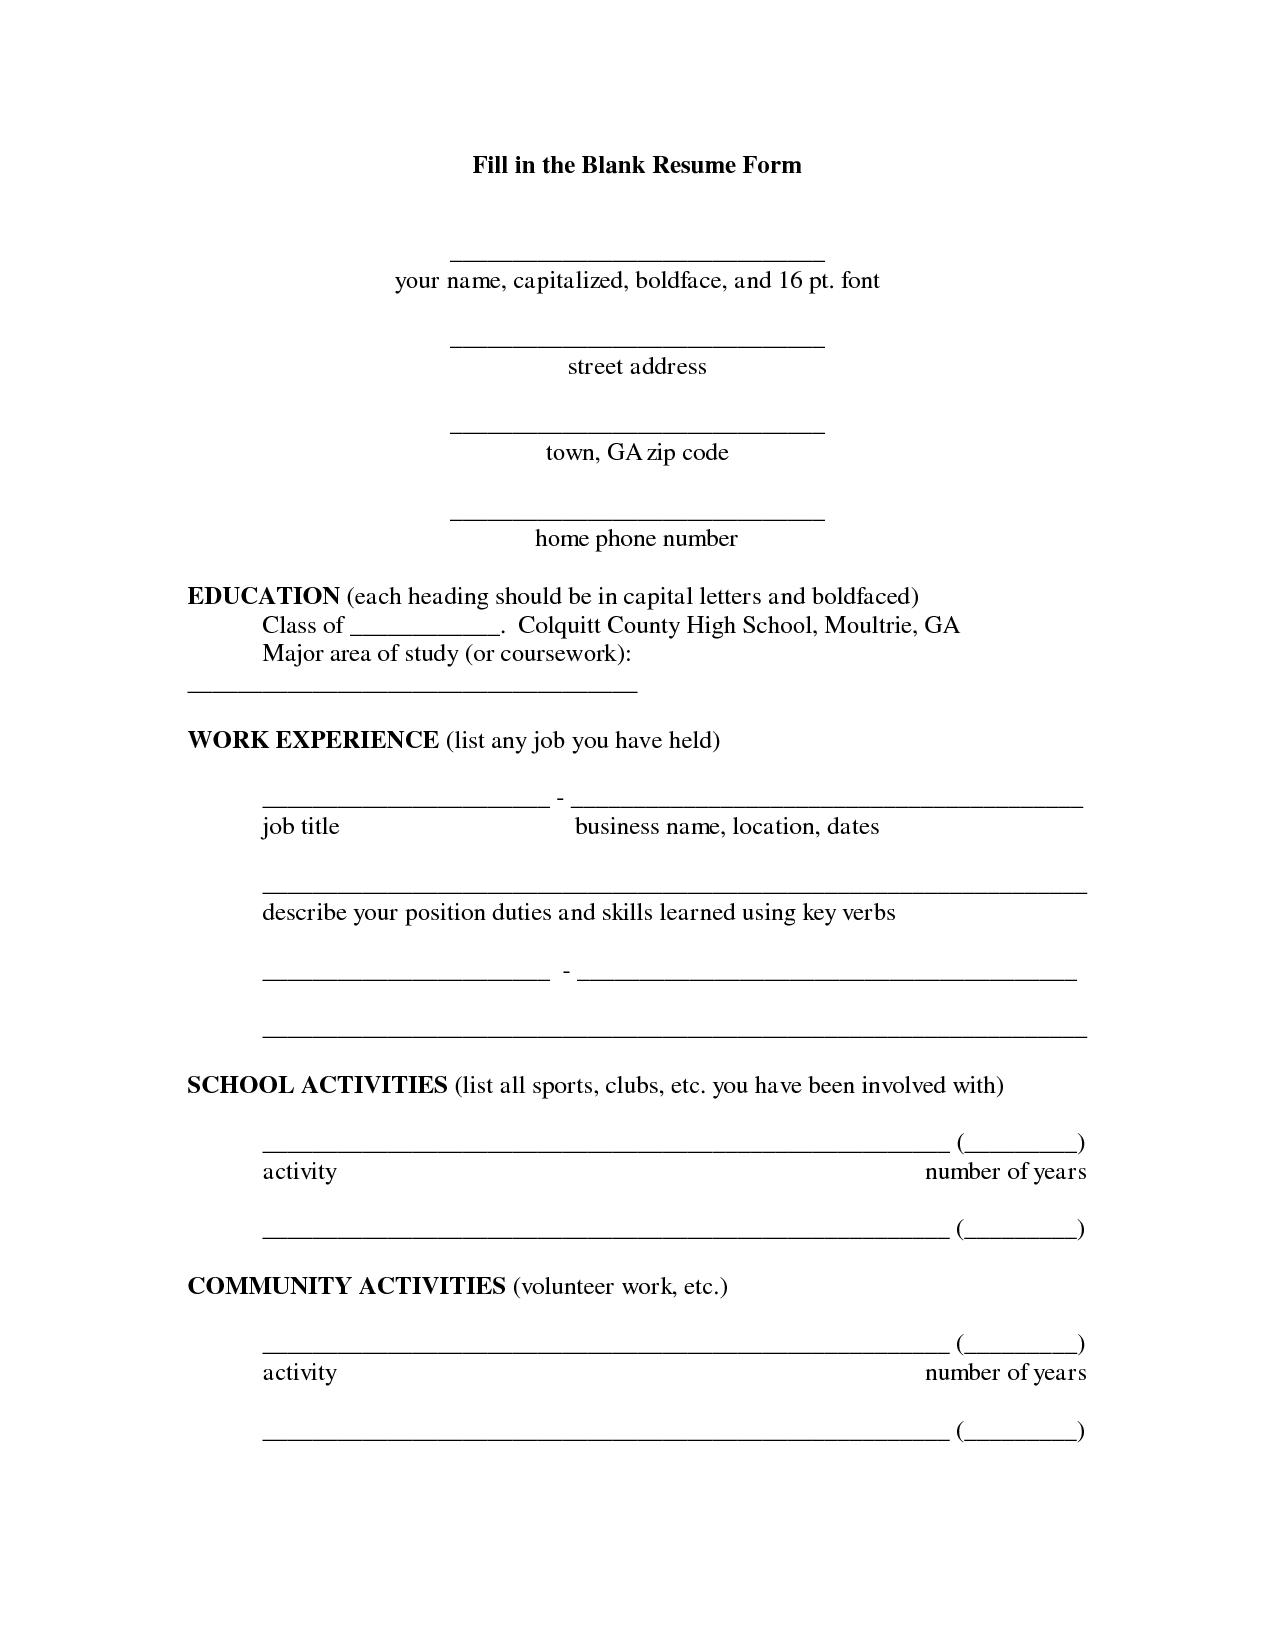 Fill In The Blank Resume PDF Resumecareer Info Fill